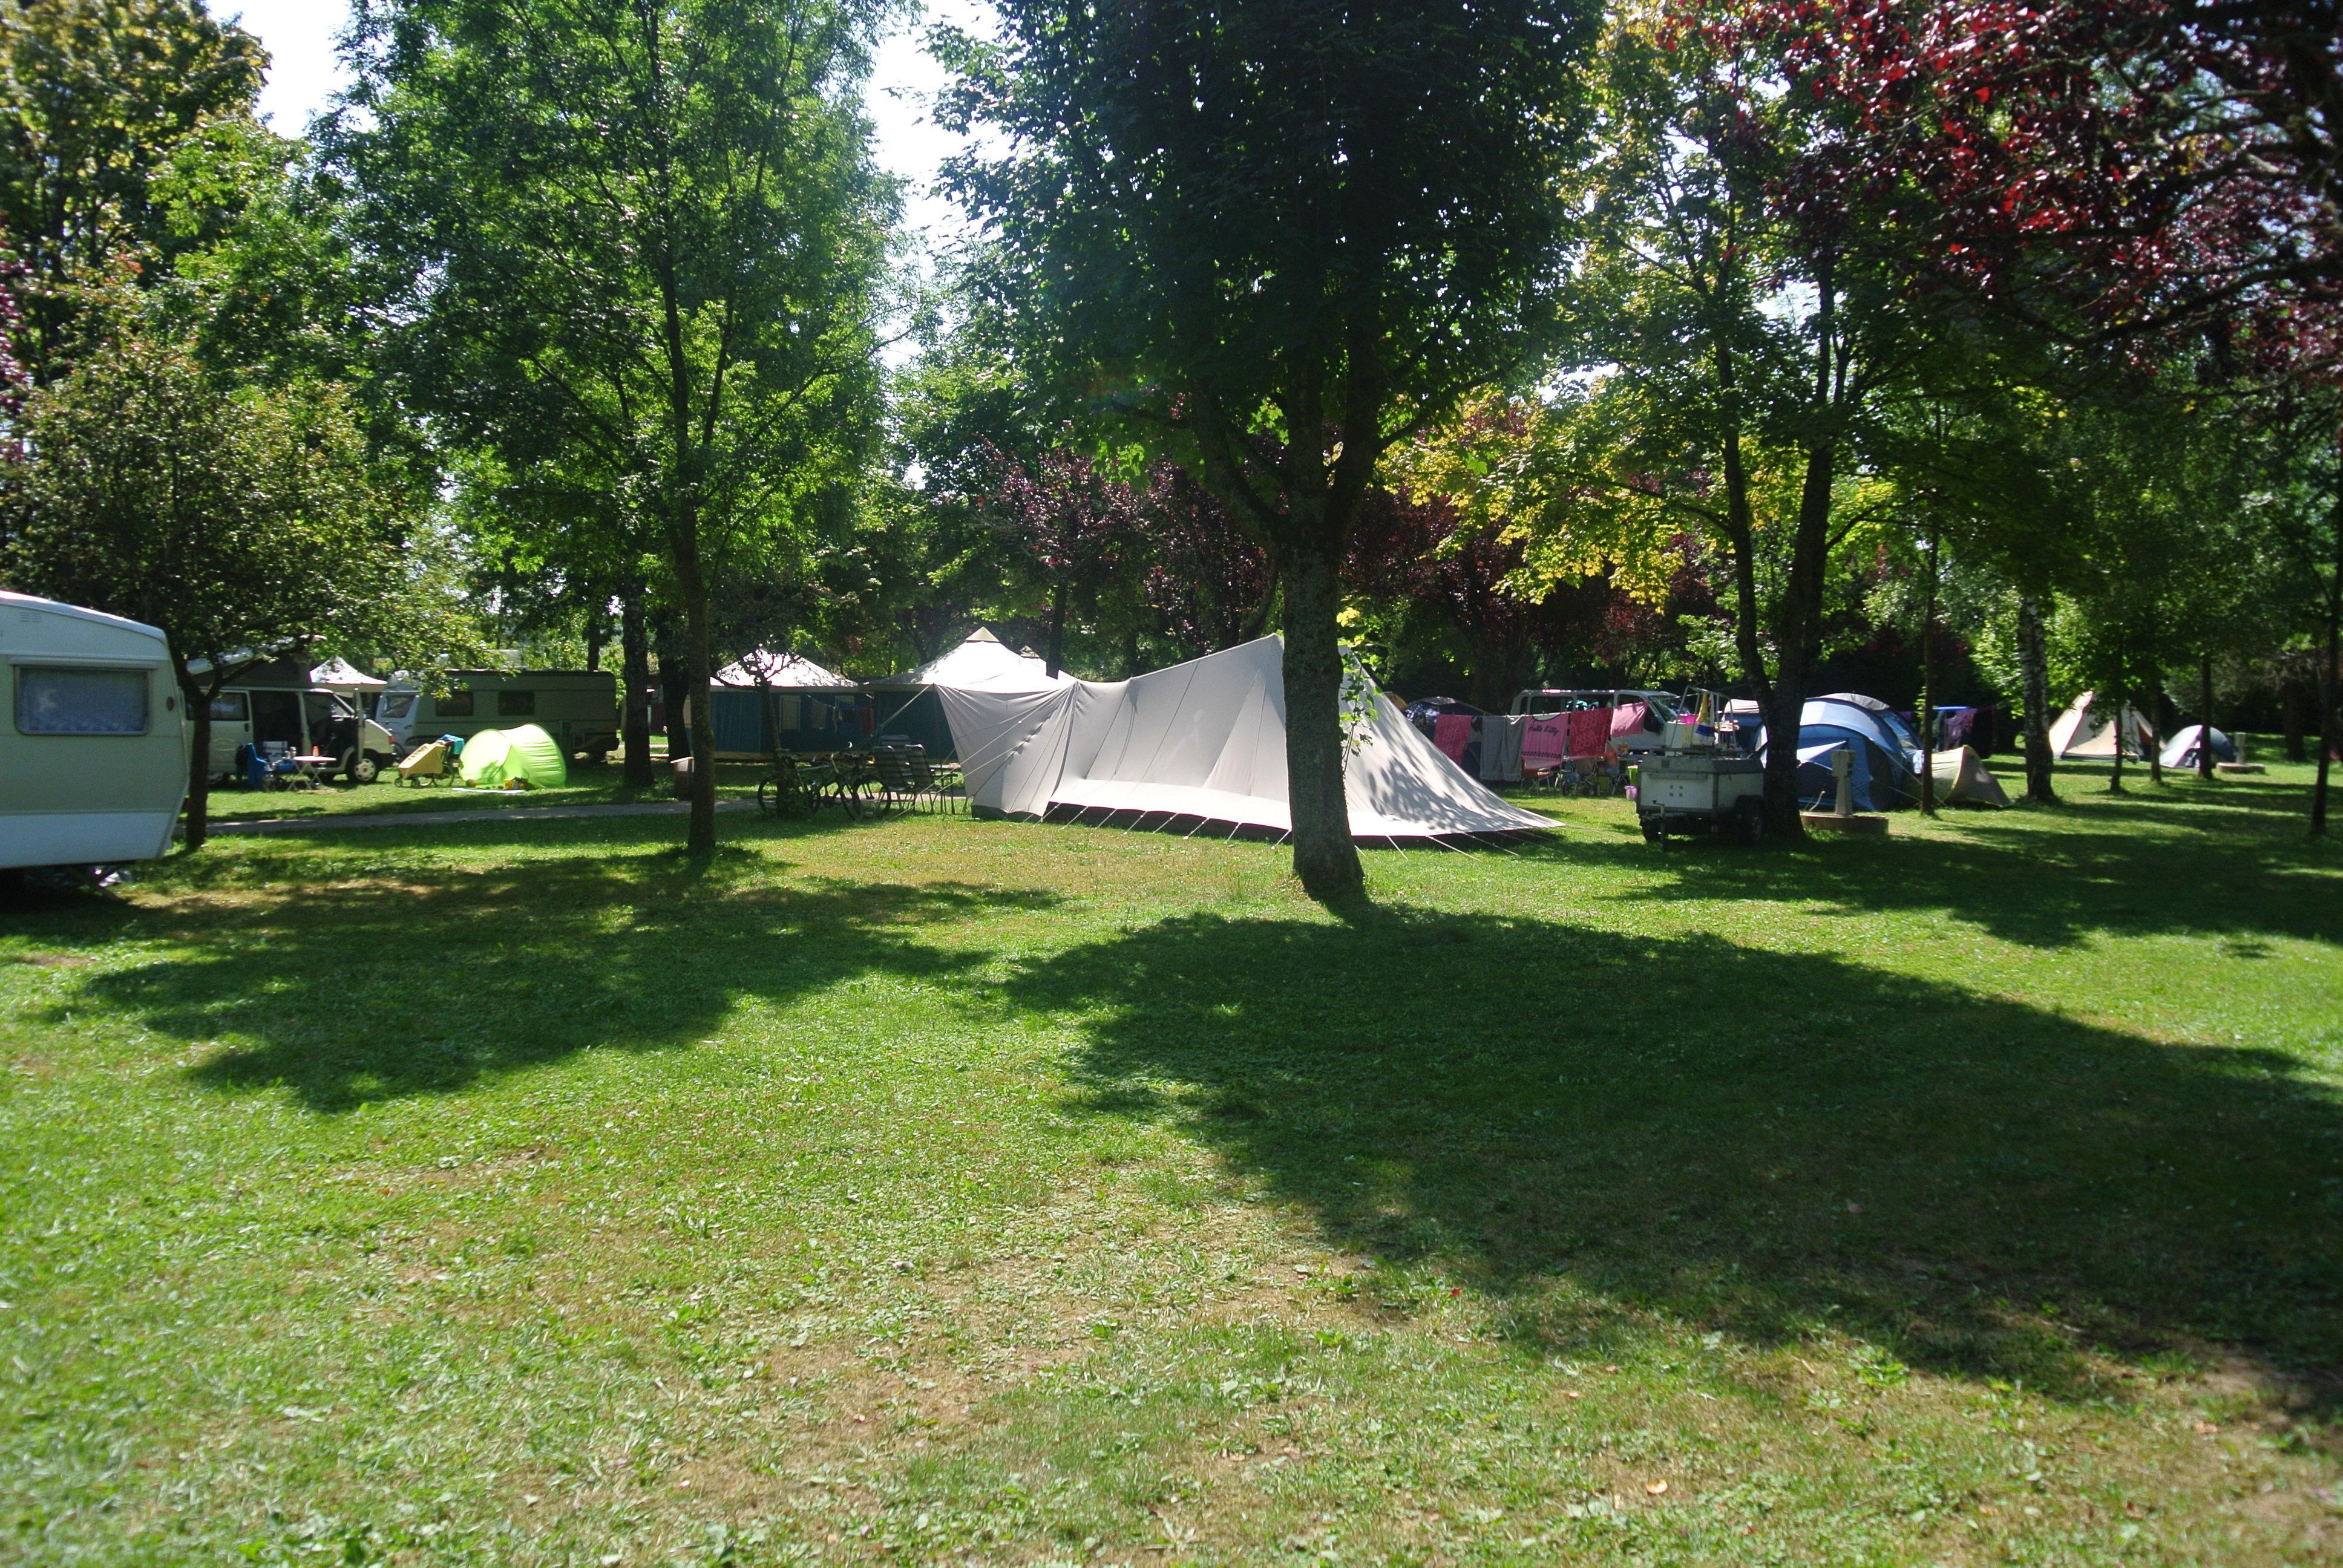 Camping le Val d'Amour, Ounans, Jura